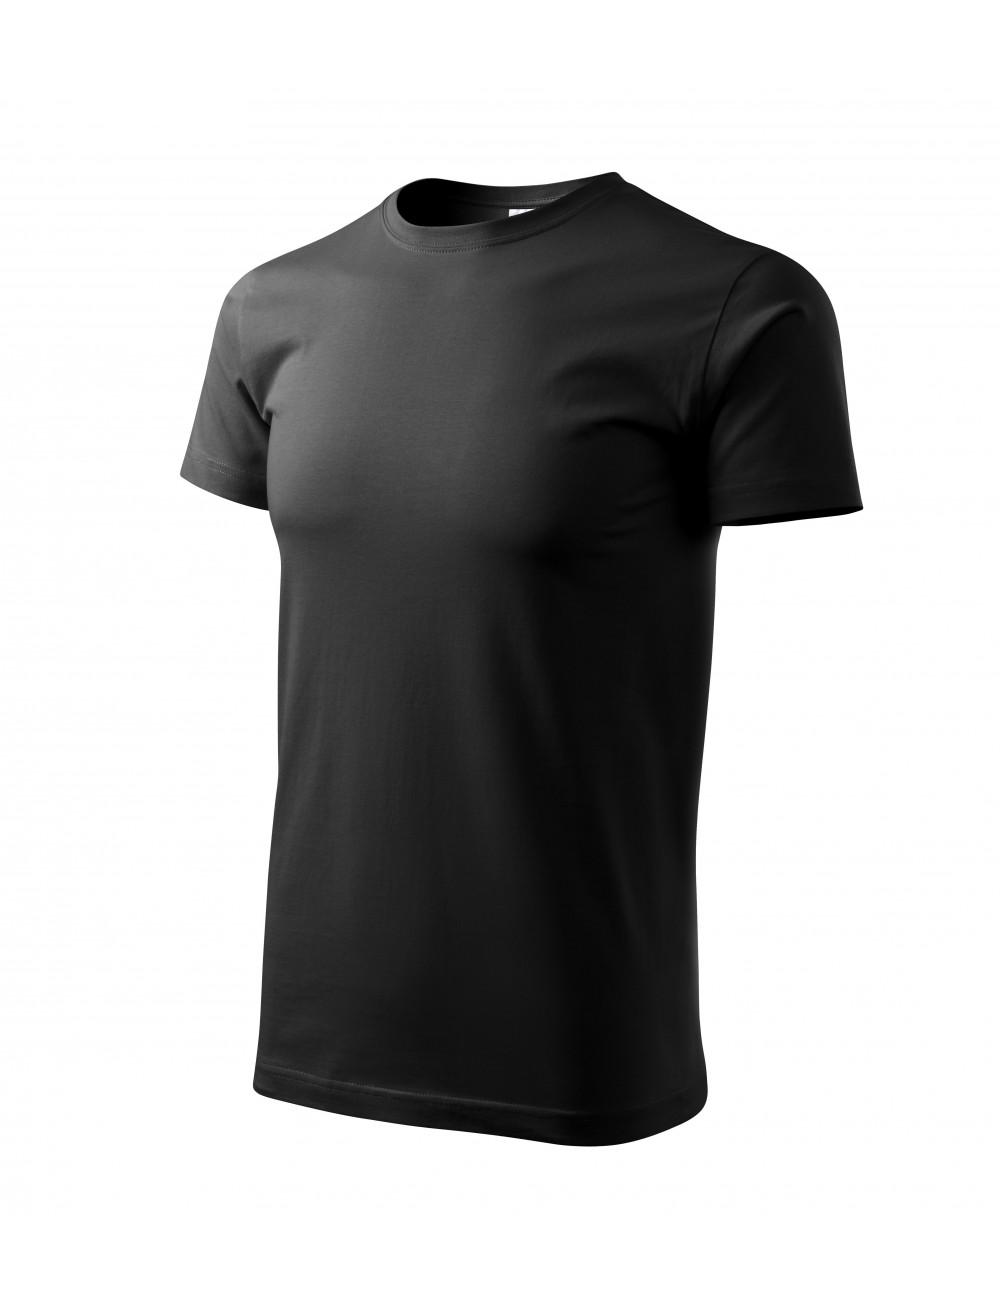 Adler MALFINI Koszulka unisex Heavy New 137 czarny